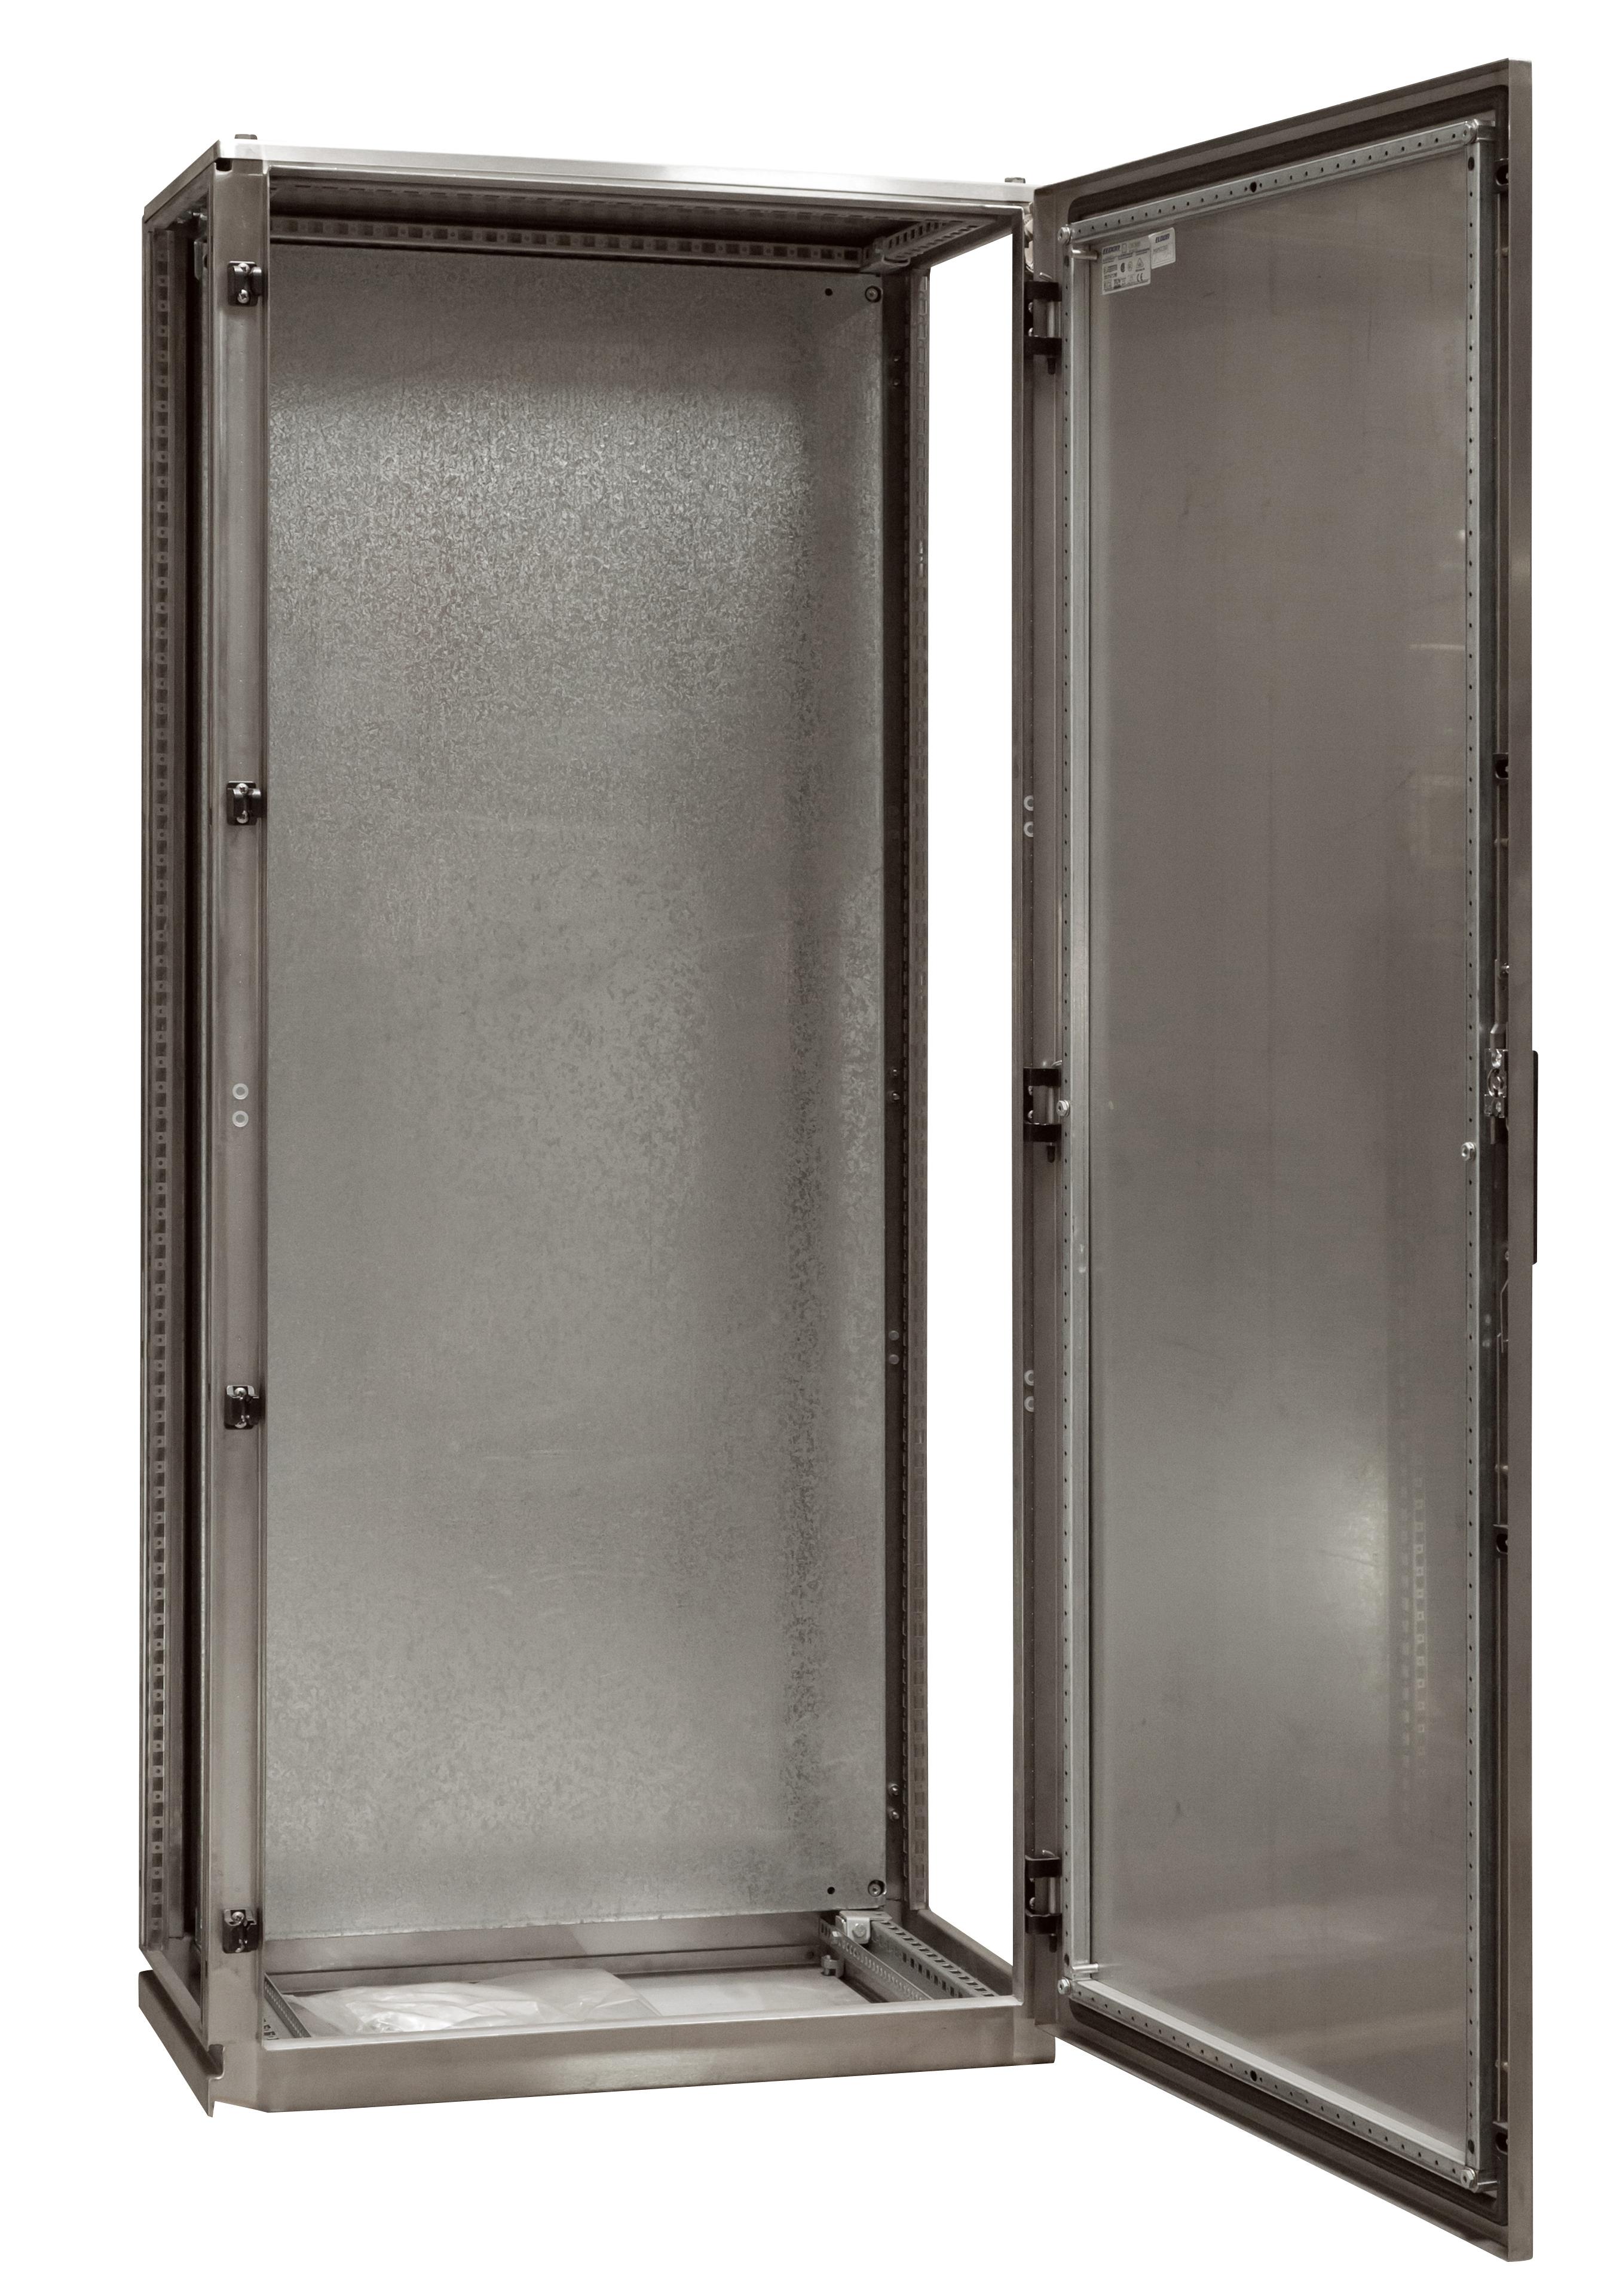 1 Stk Anreihschrank Edelstahl 1-türig, 1800x1000x500mm, AISI 304L ASR181050-